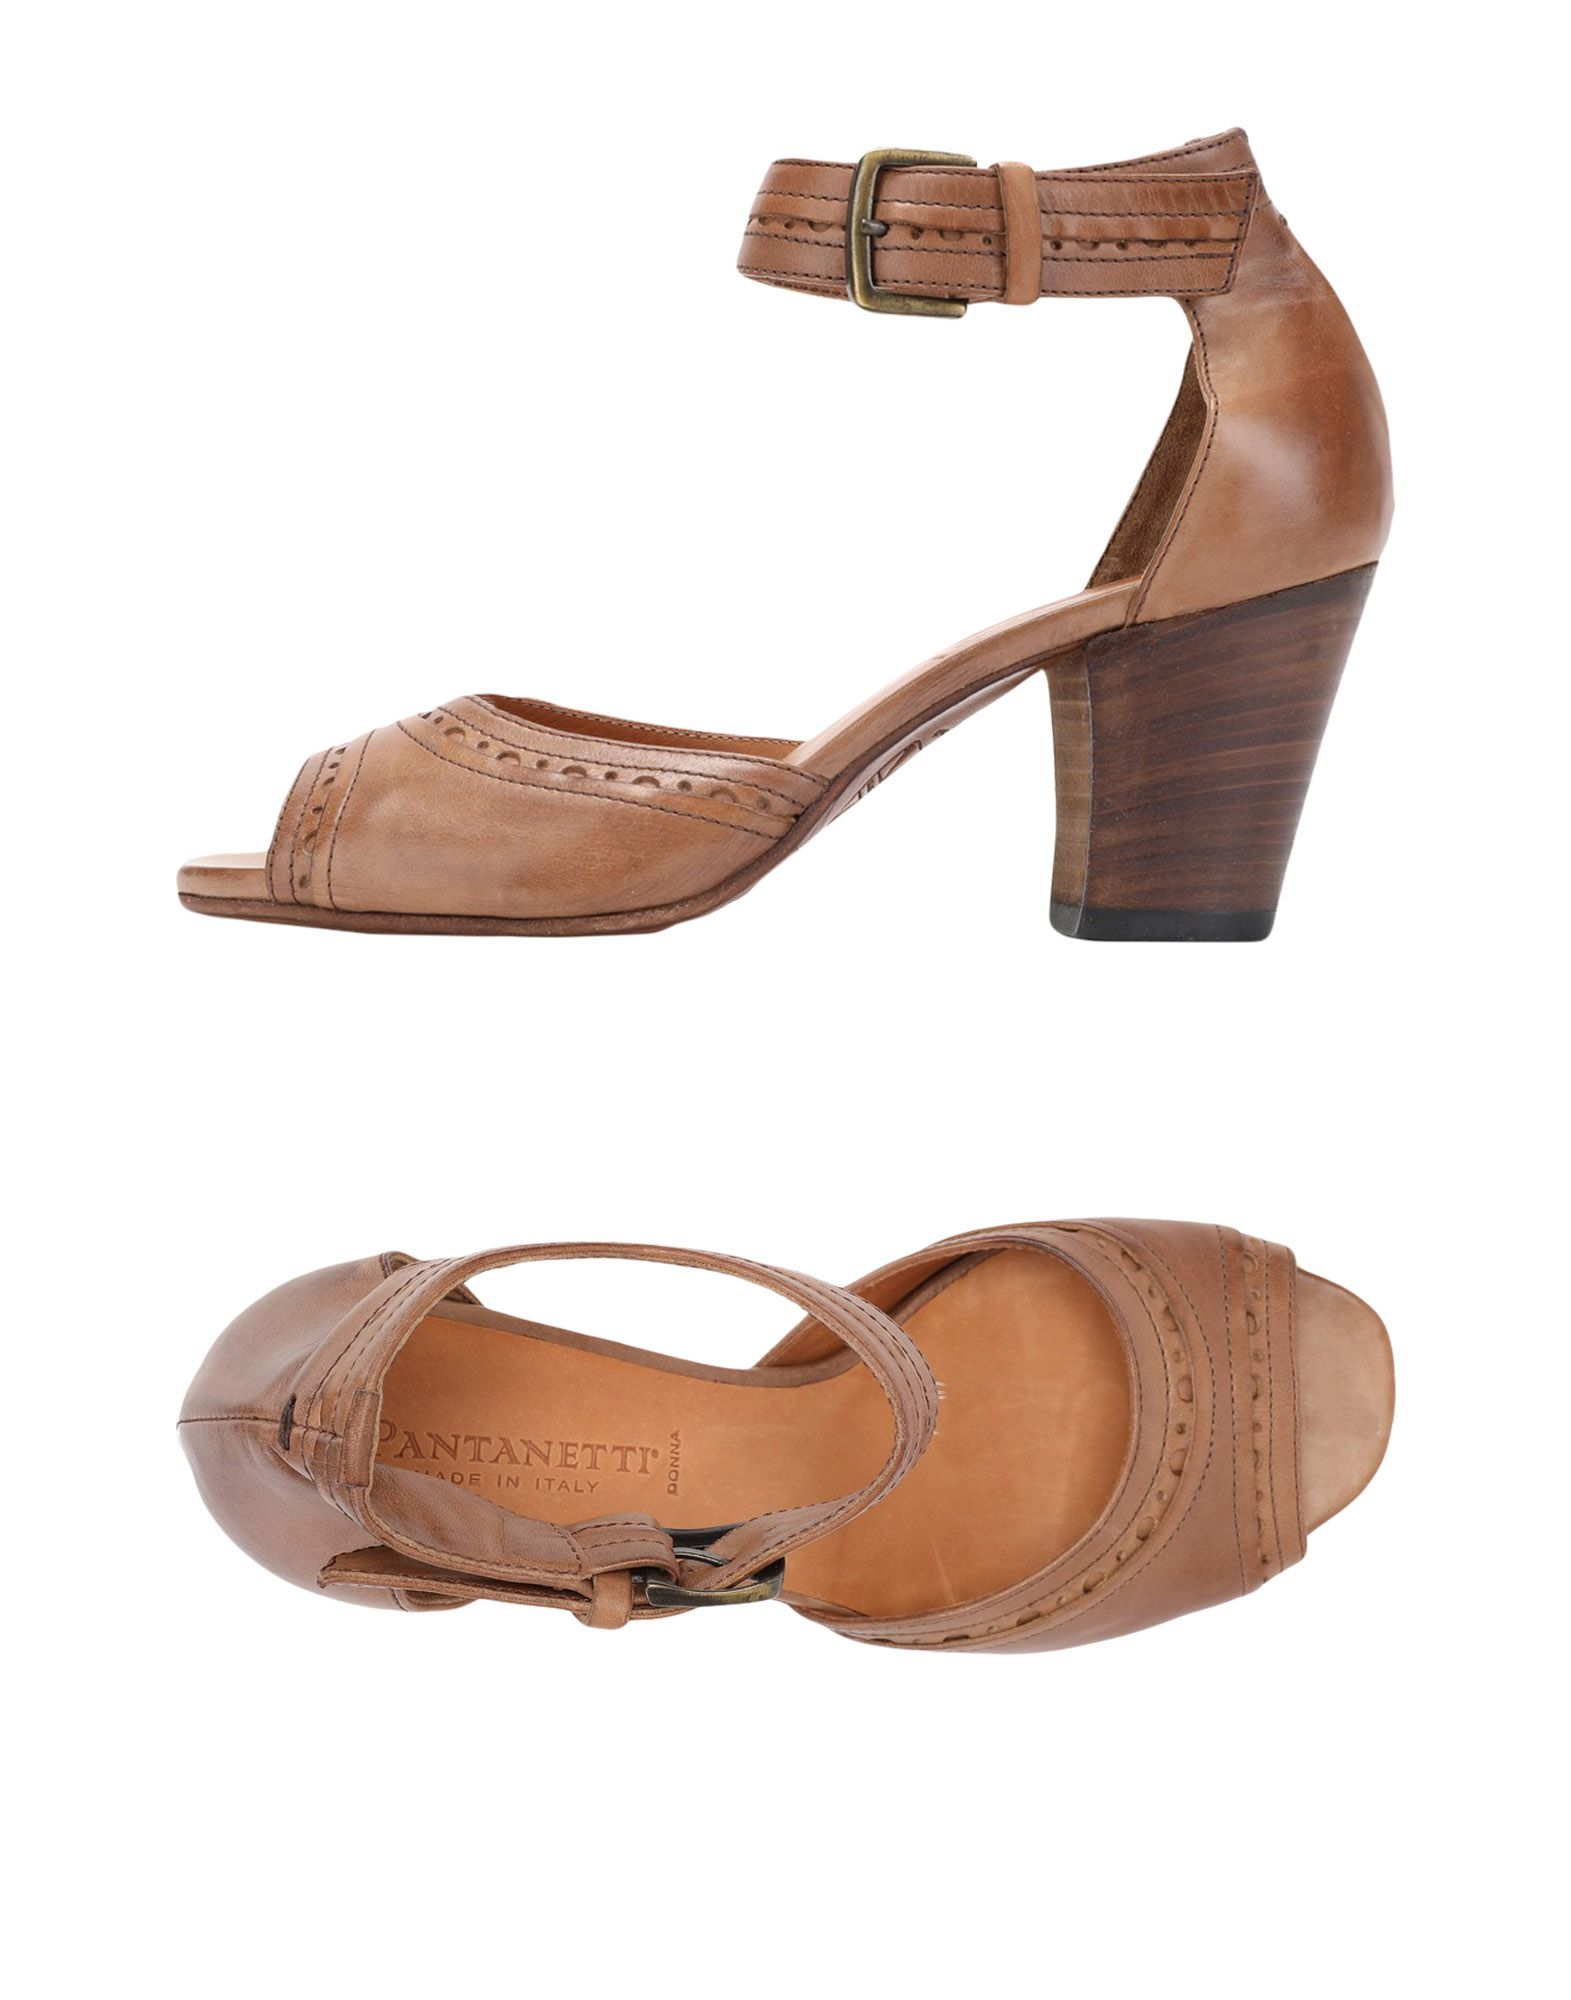 Pantanetti Sandalen Damen Heiße  11362392LF Heiße Damen Schuhe a758ff